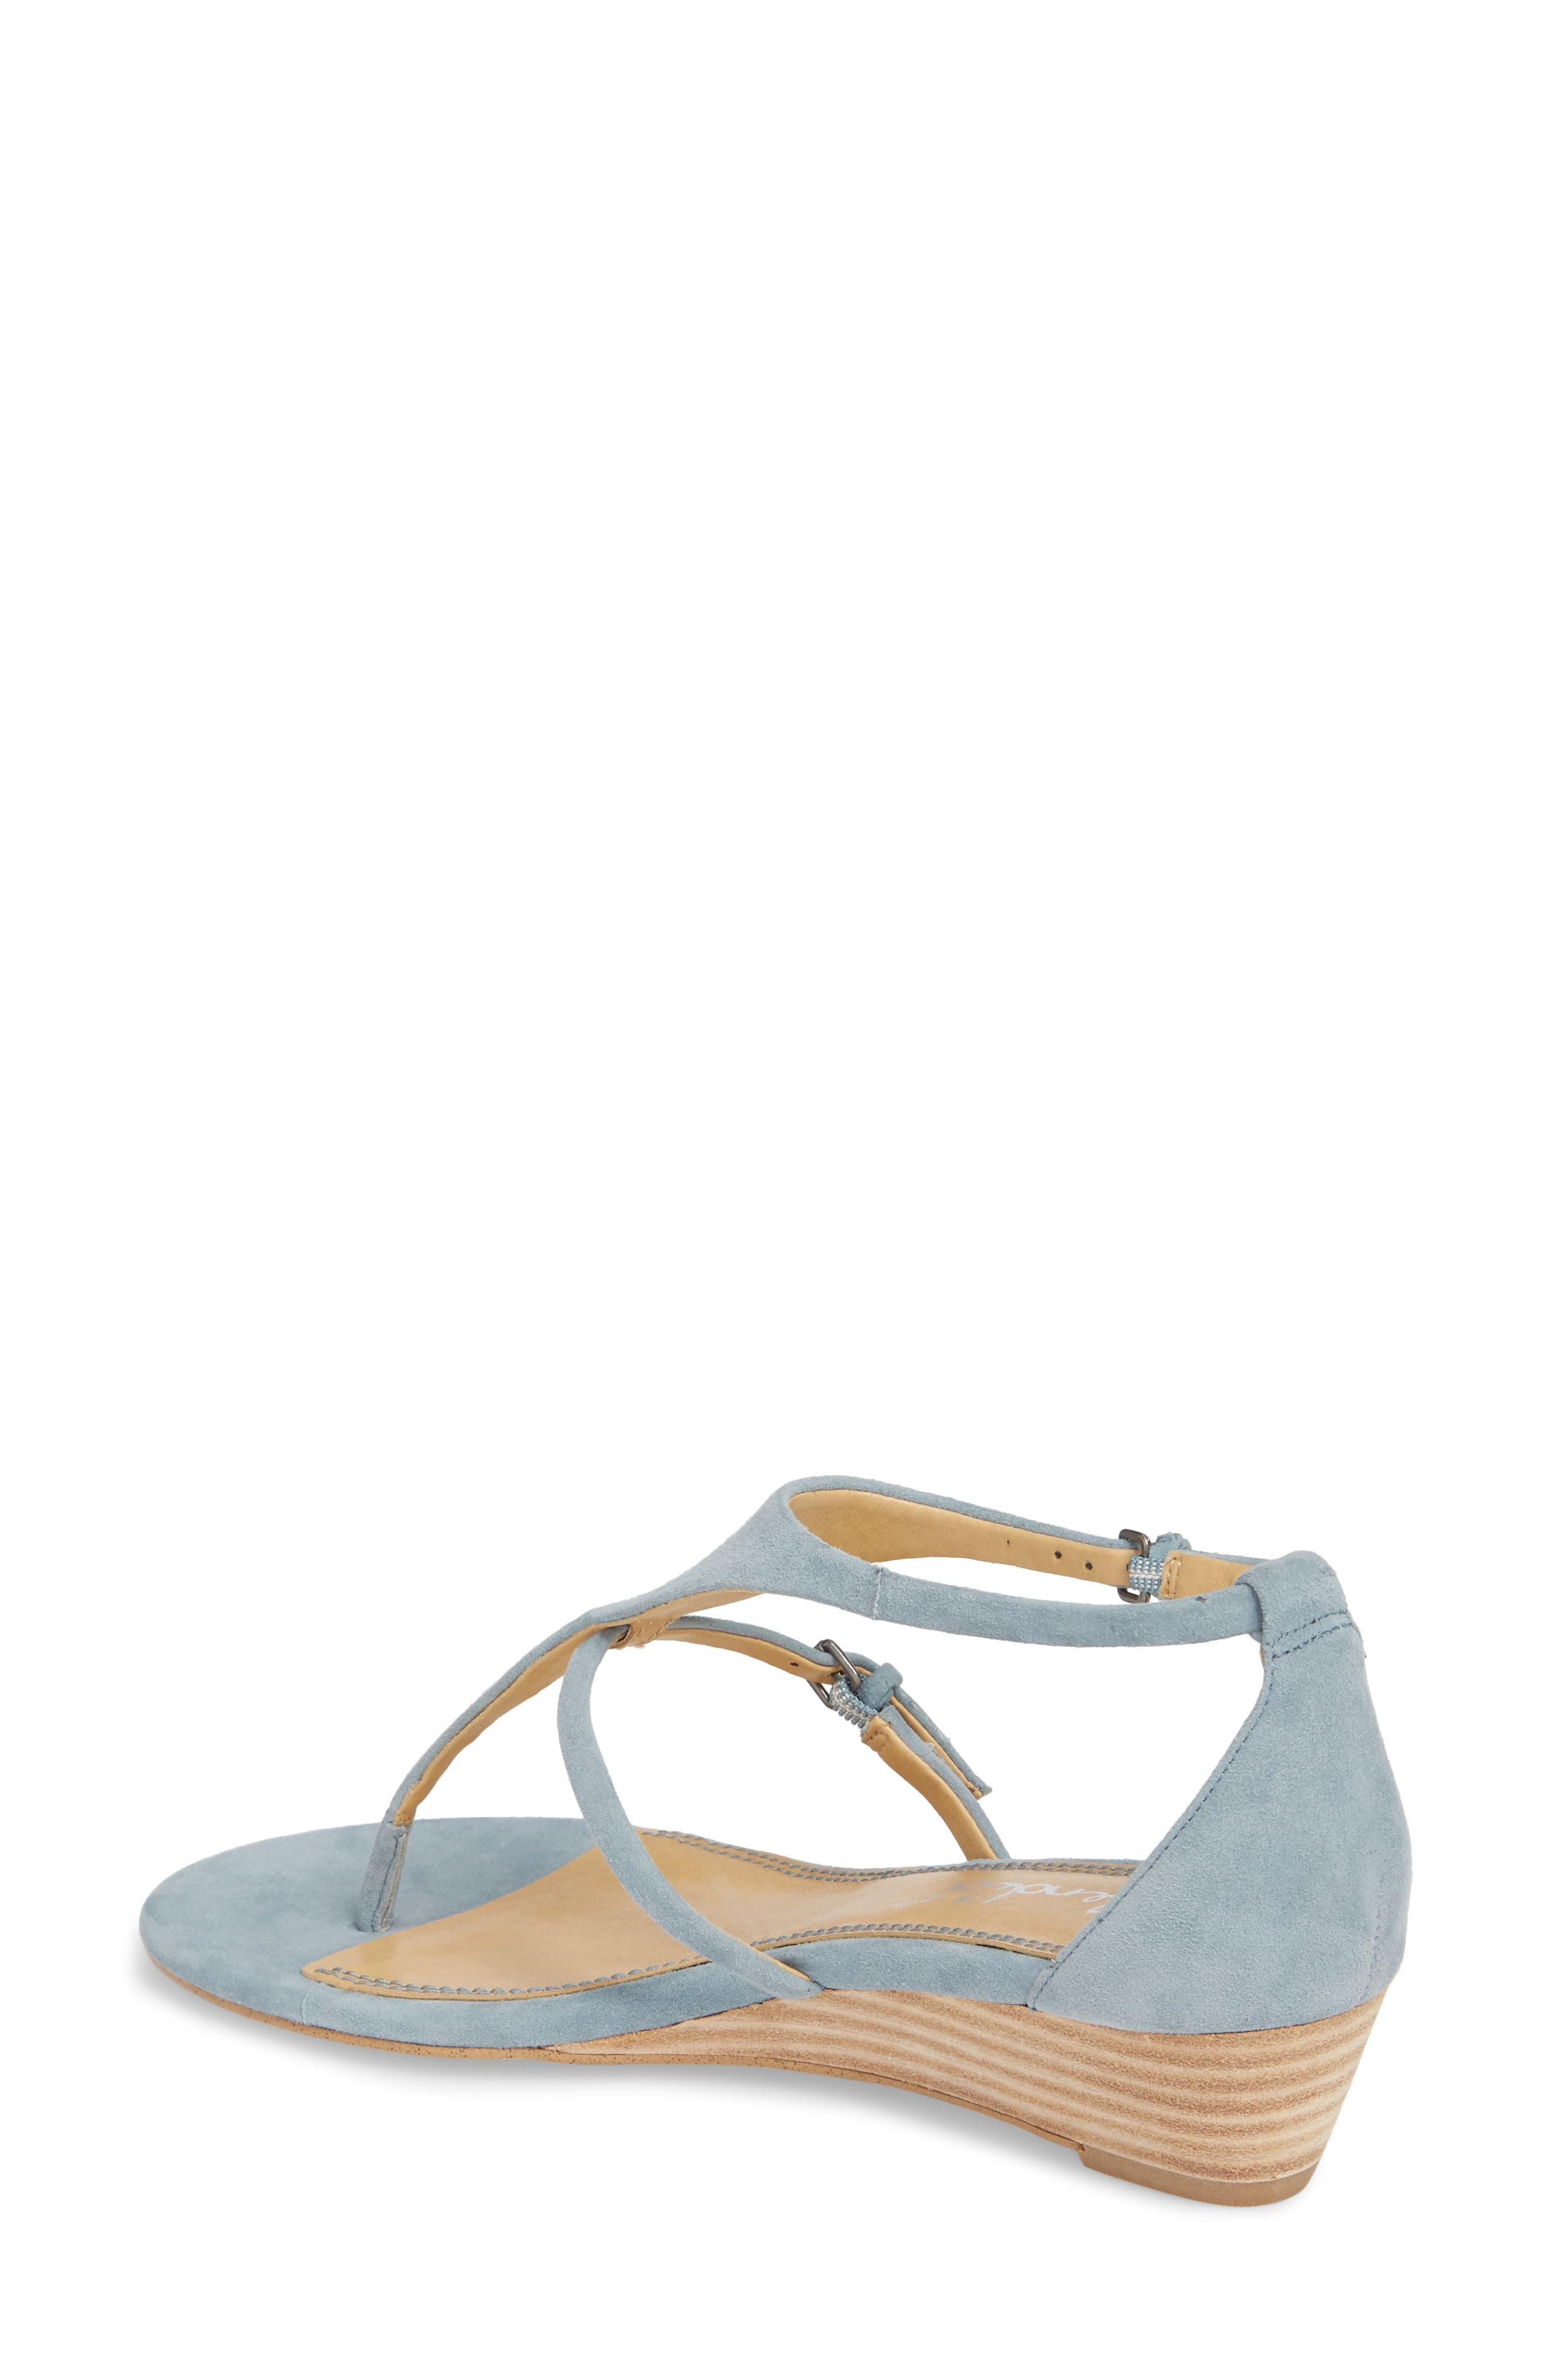 Brooklyn V-Strap Wedge Sandal,                             Alternate thumbnail 8, color,